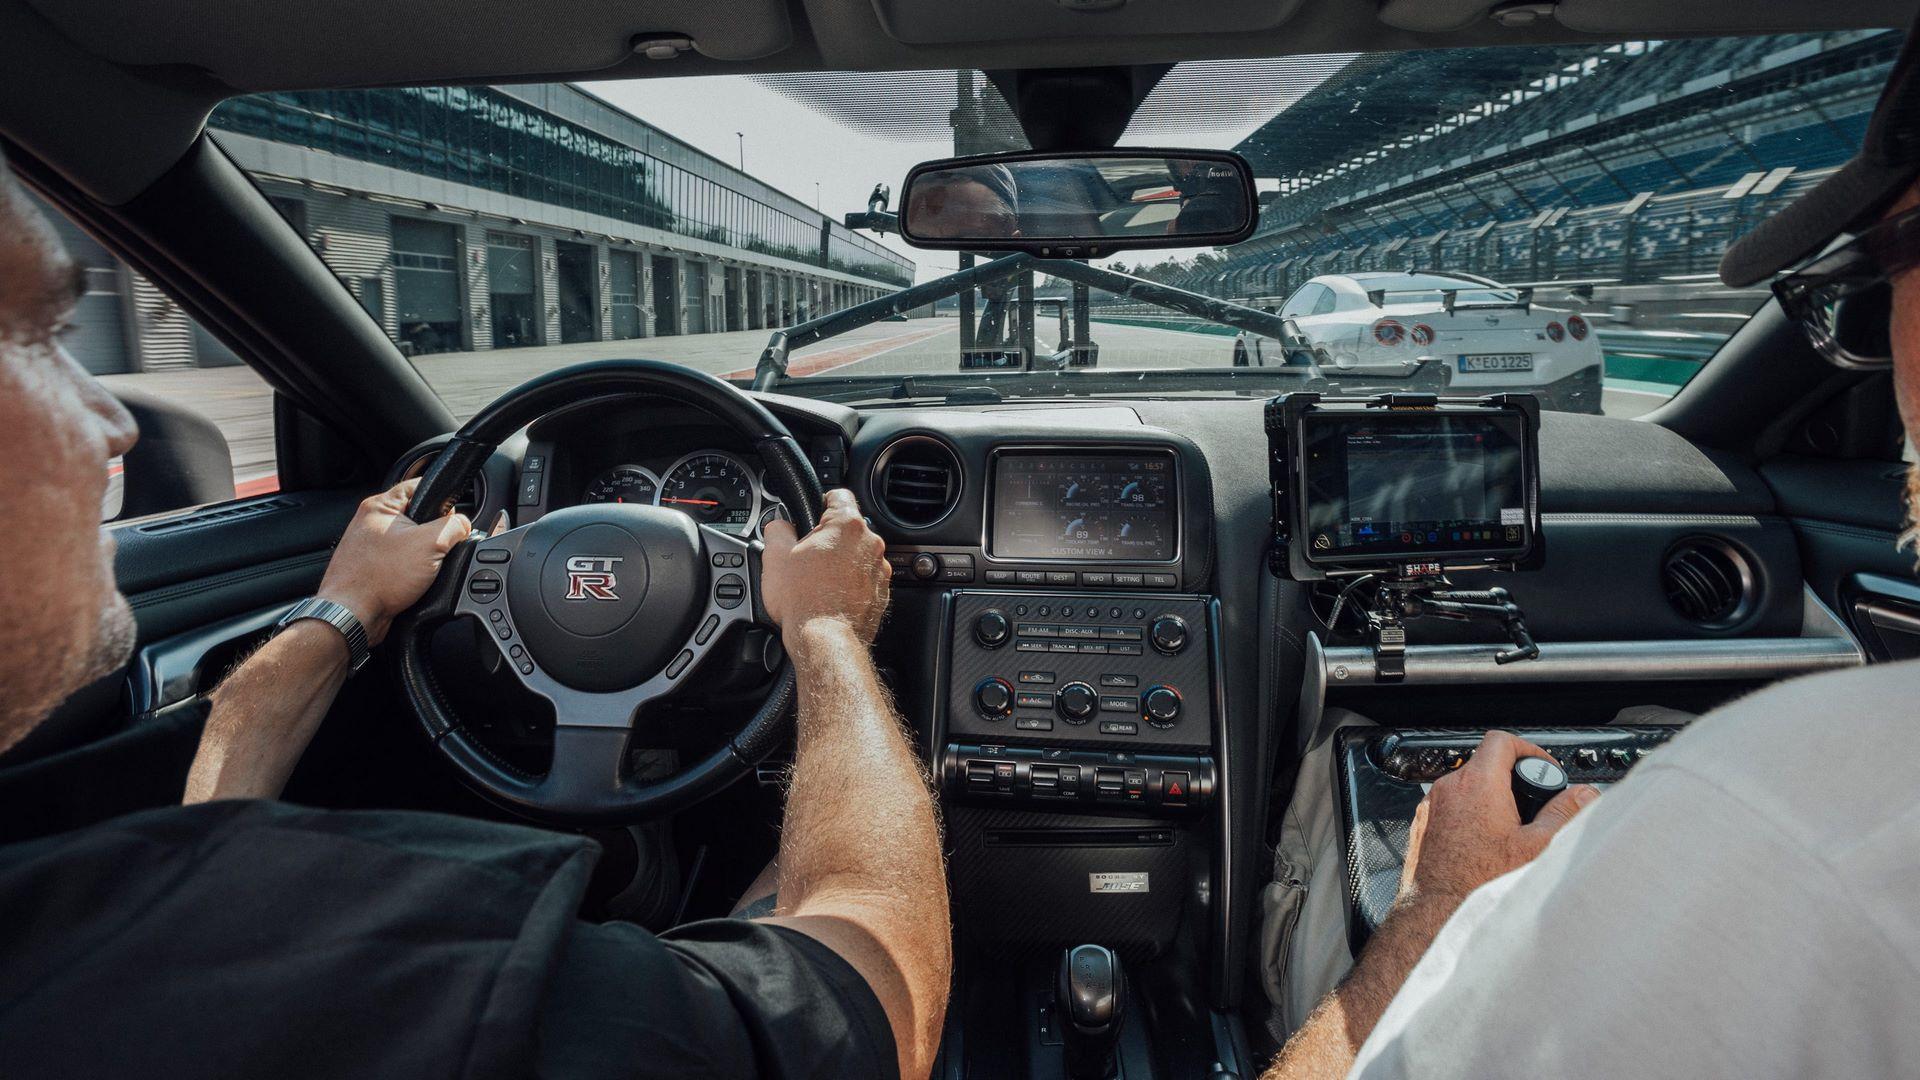 Nissan-GT-R-Camera-Car-8